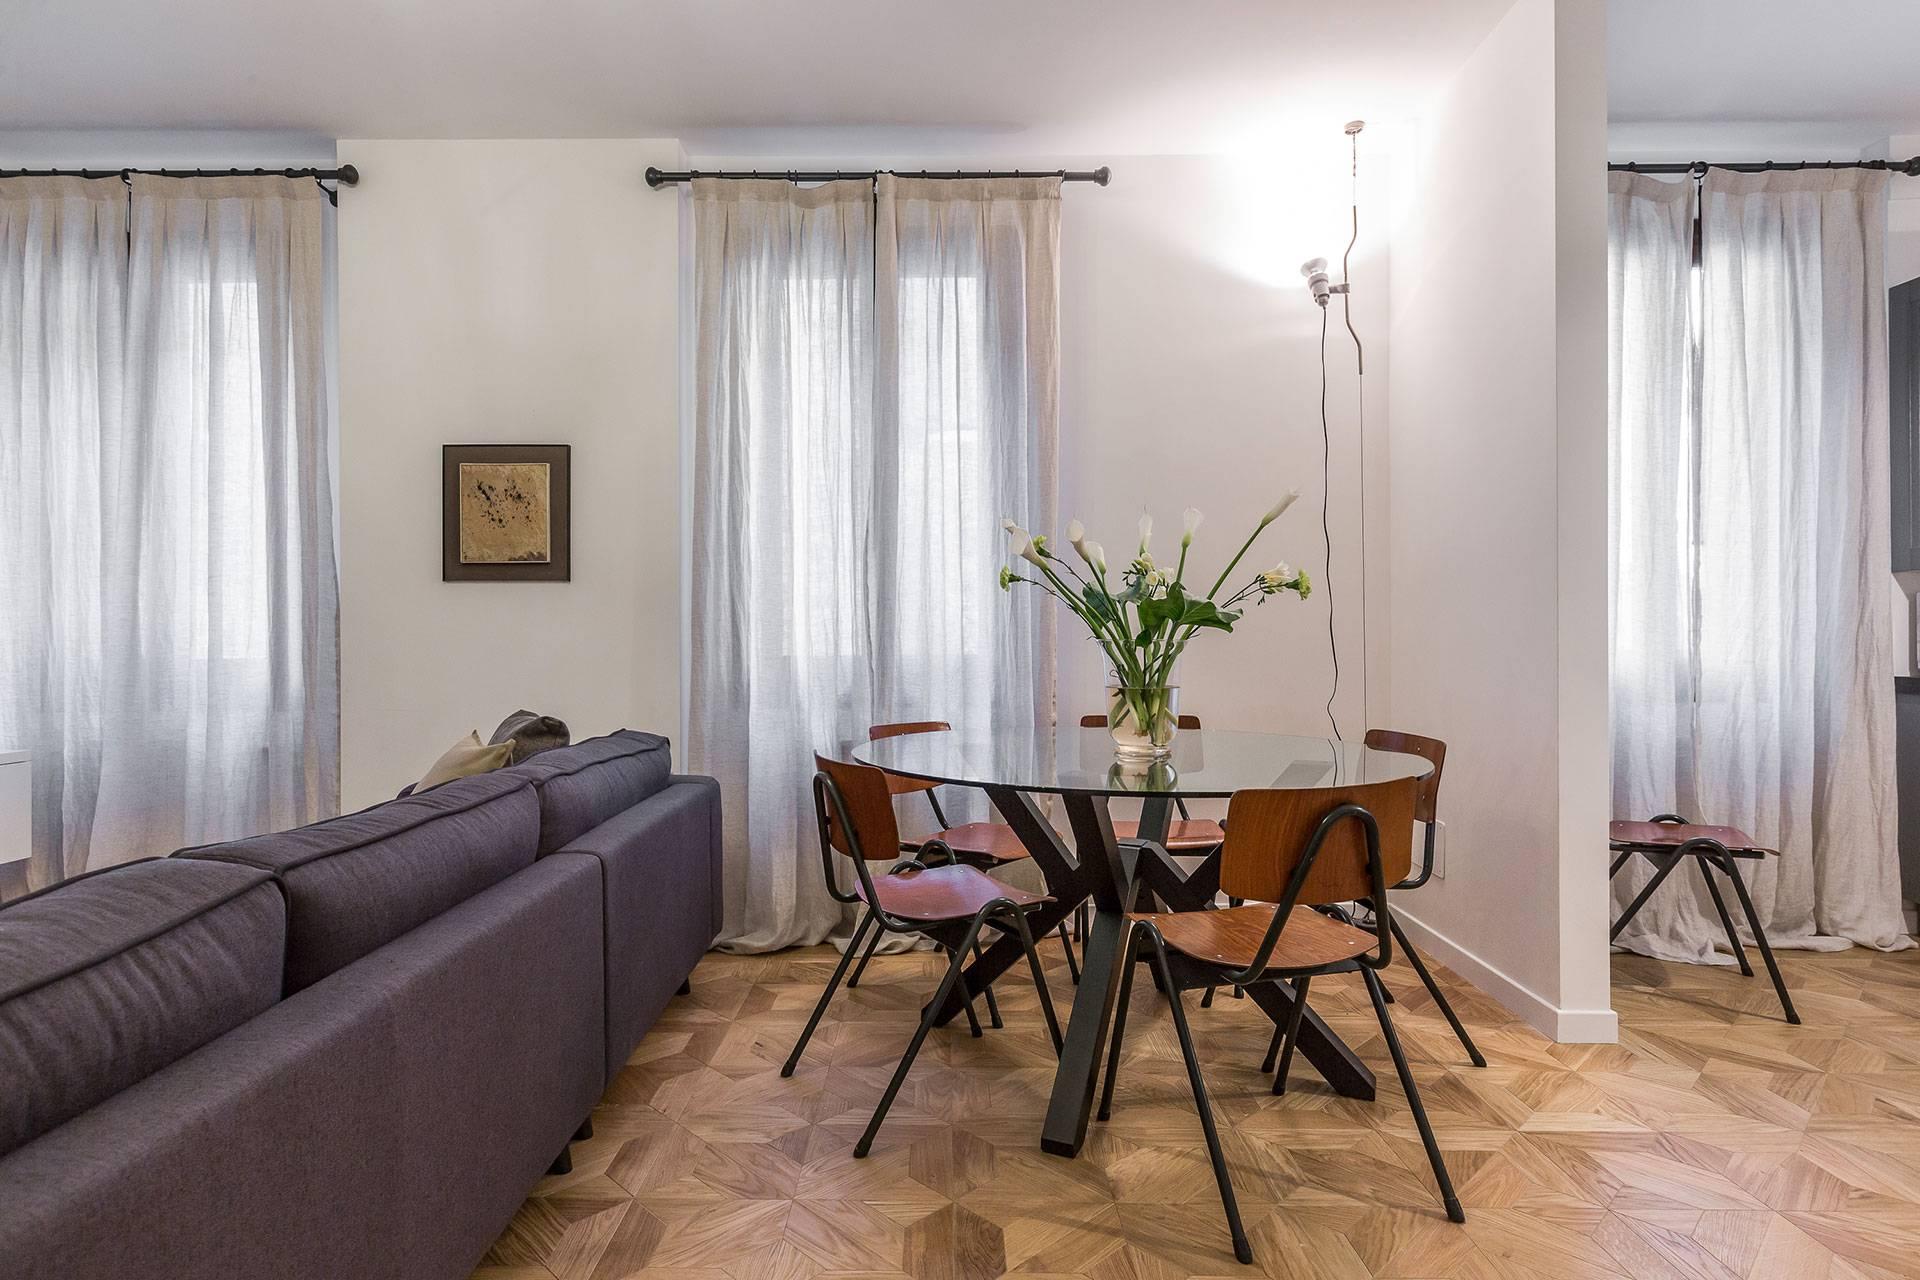 designer furniture on nice parquet flooring and smooth textiles